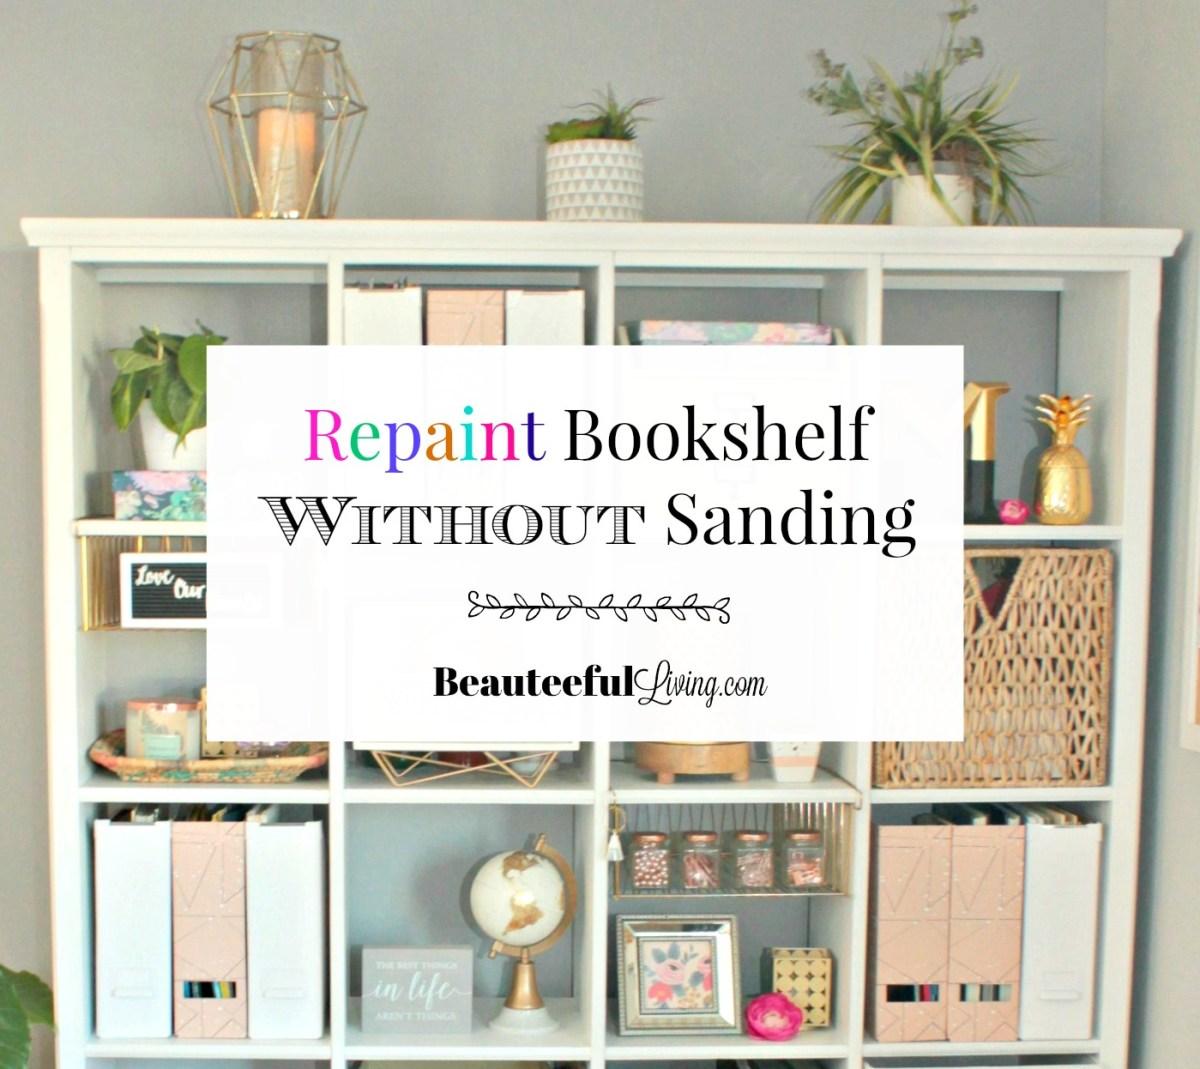 Repaint Bookshelf Without Sanding